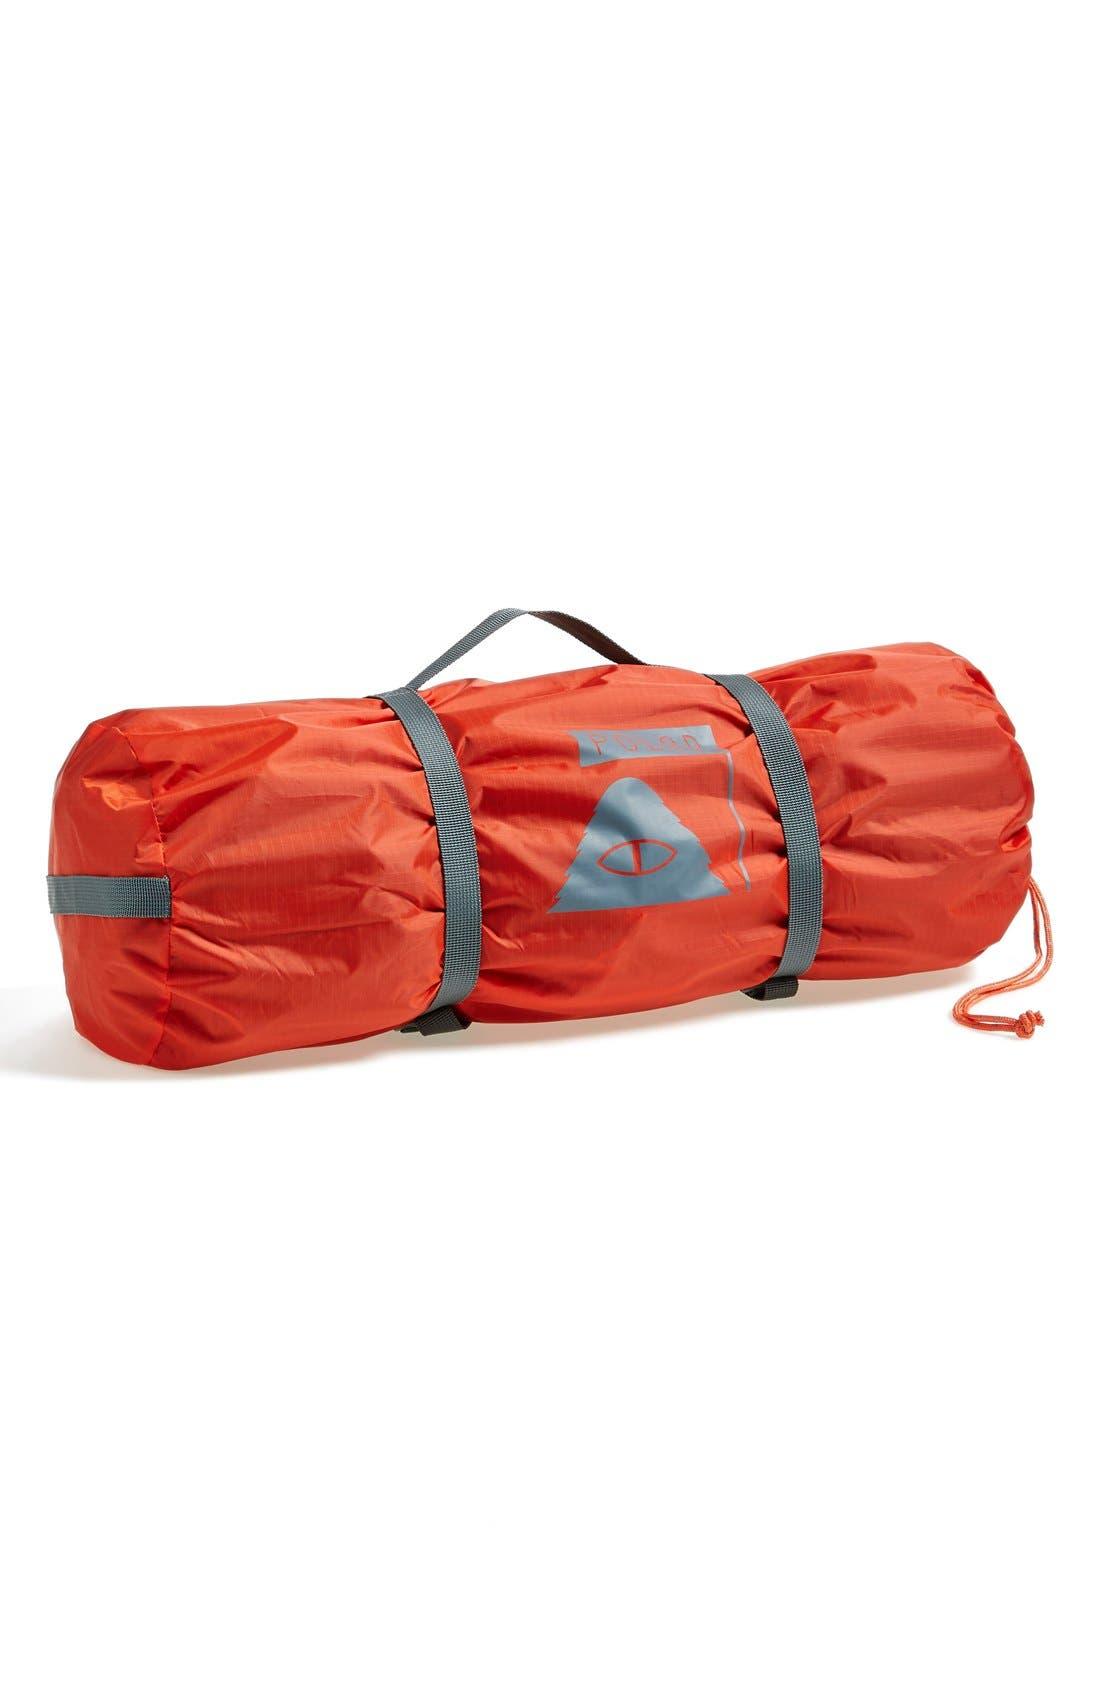 Alternate Image 3  - Poler Two-Person Tent & Waterproof Rain Fly